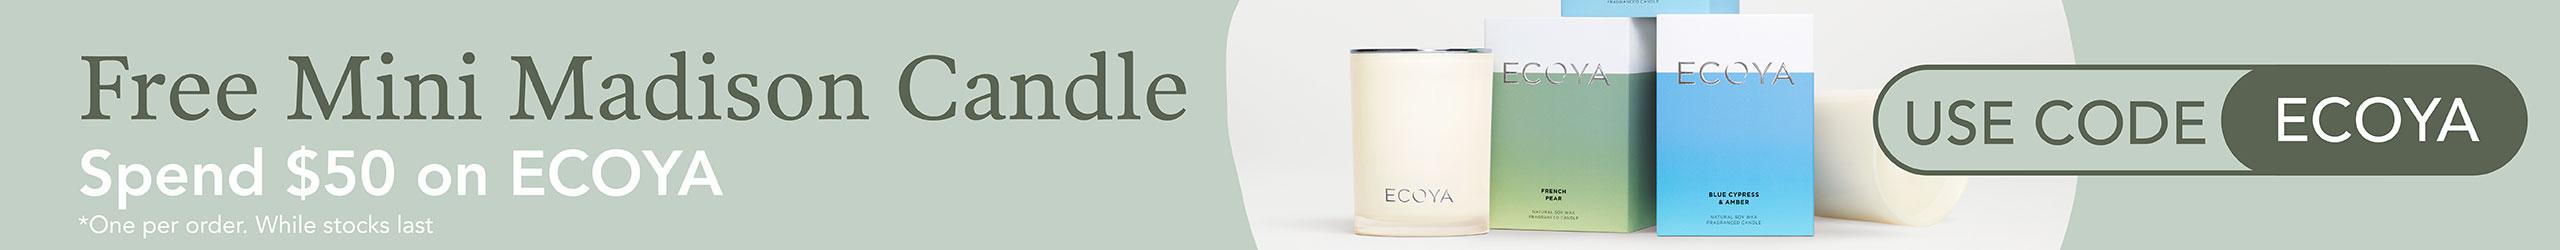 Free Gift Set from ECOYA